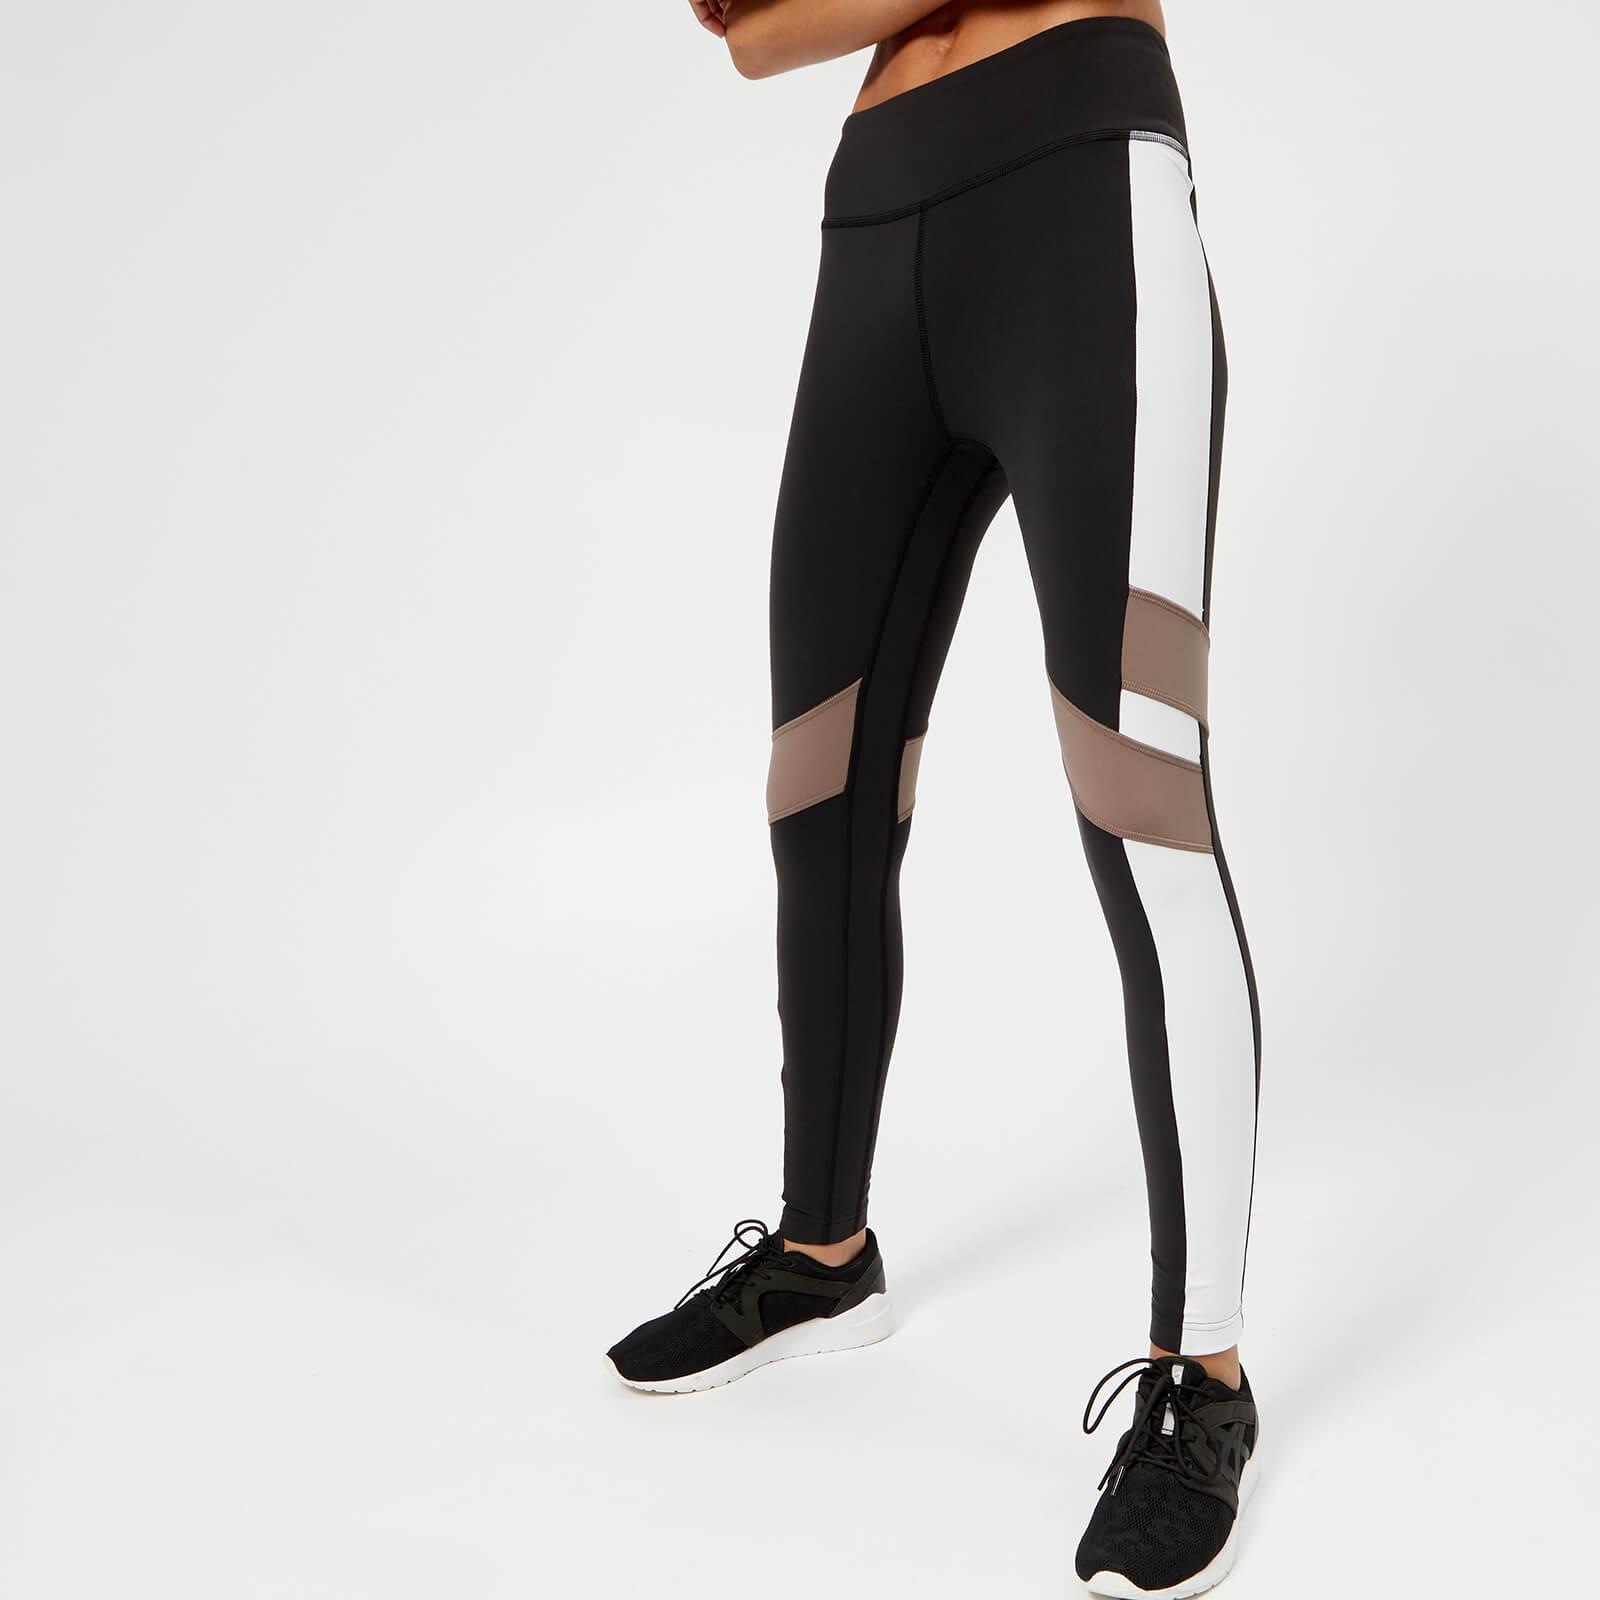 955ceaec36 Reebok Women's Lux Colour Block Tights - Black Sports & Leisure | TheHut.com